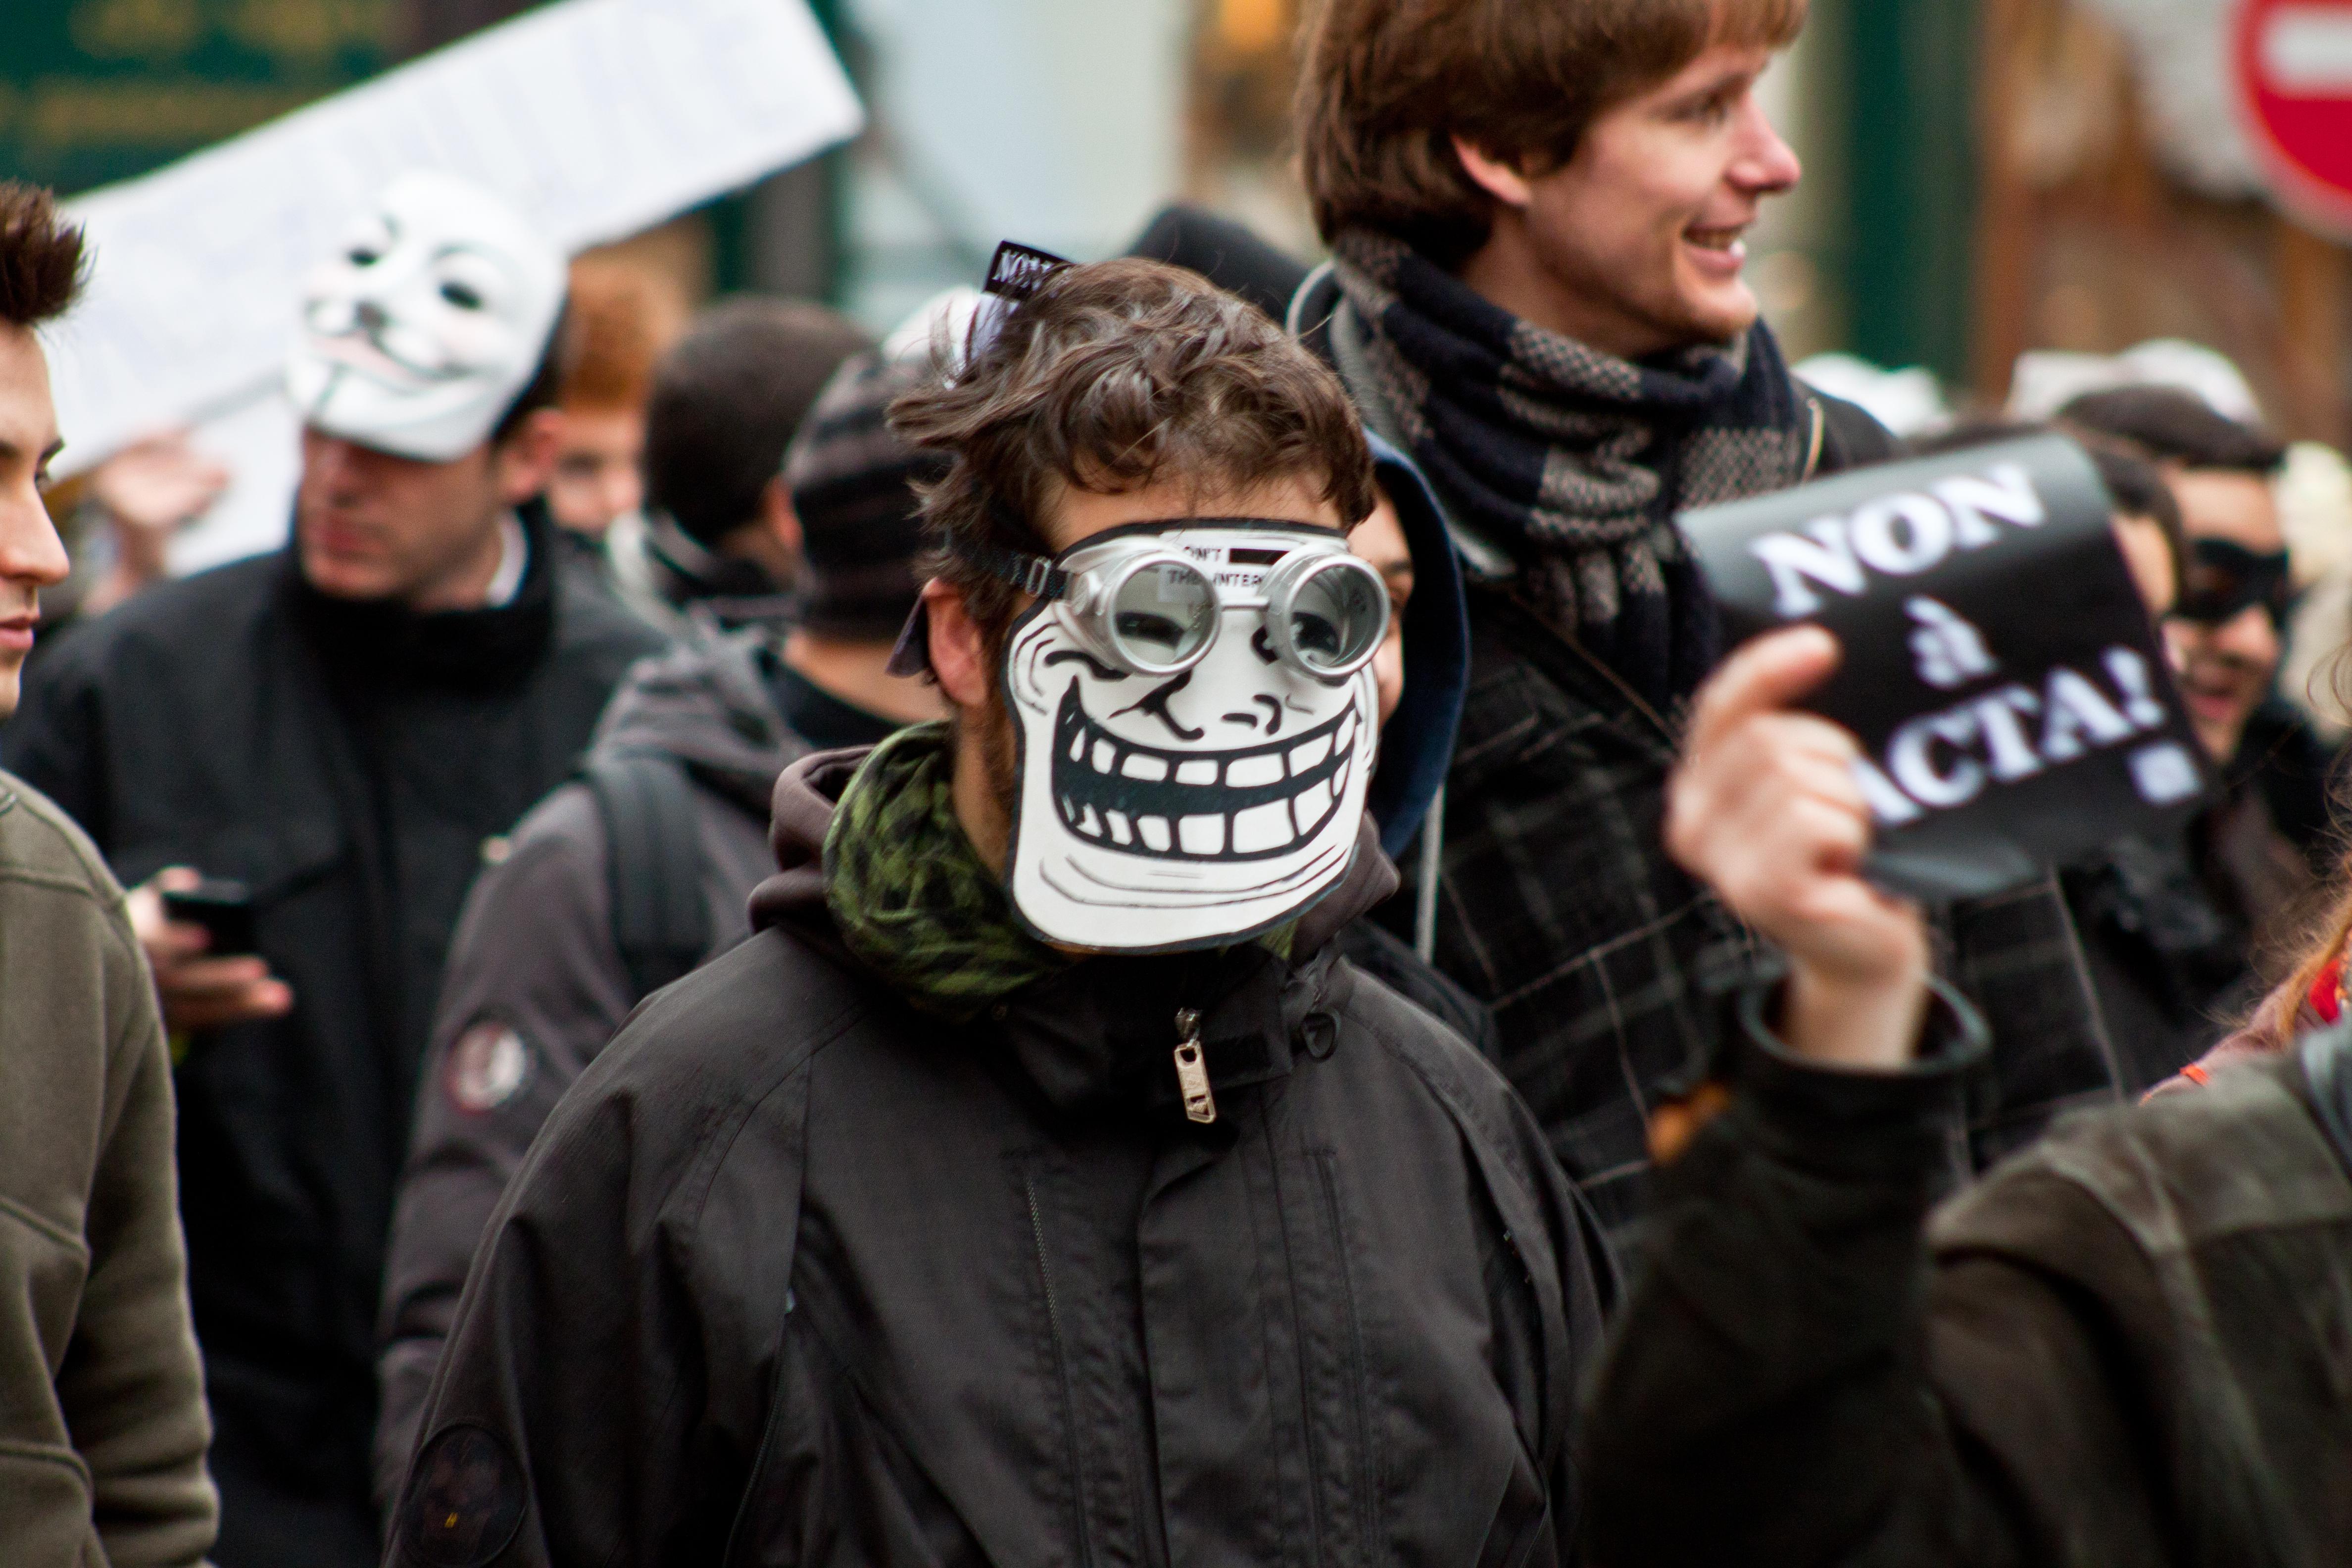 file4chan anti acta le 25 f233vrier 2012jpg wikimedia